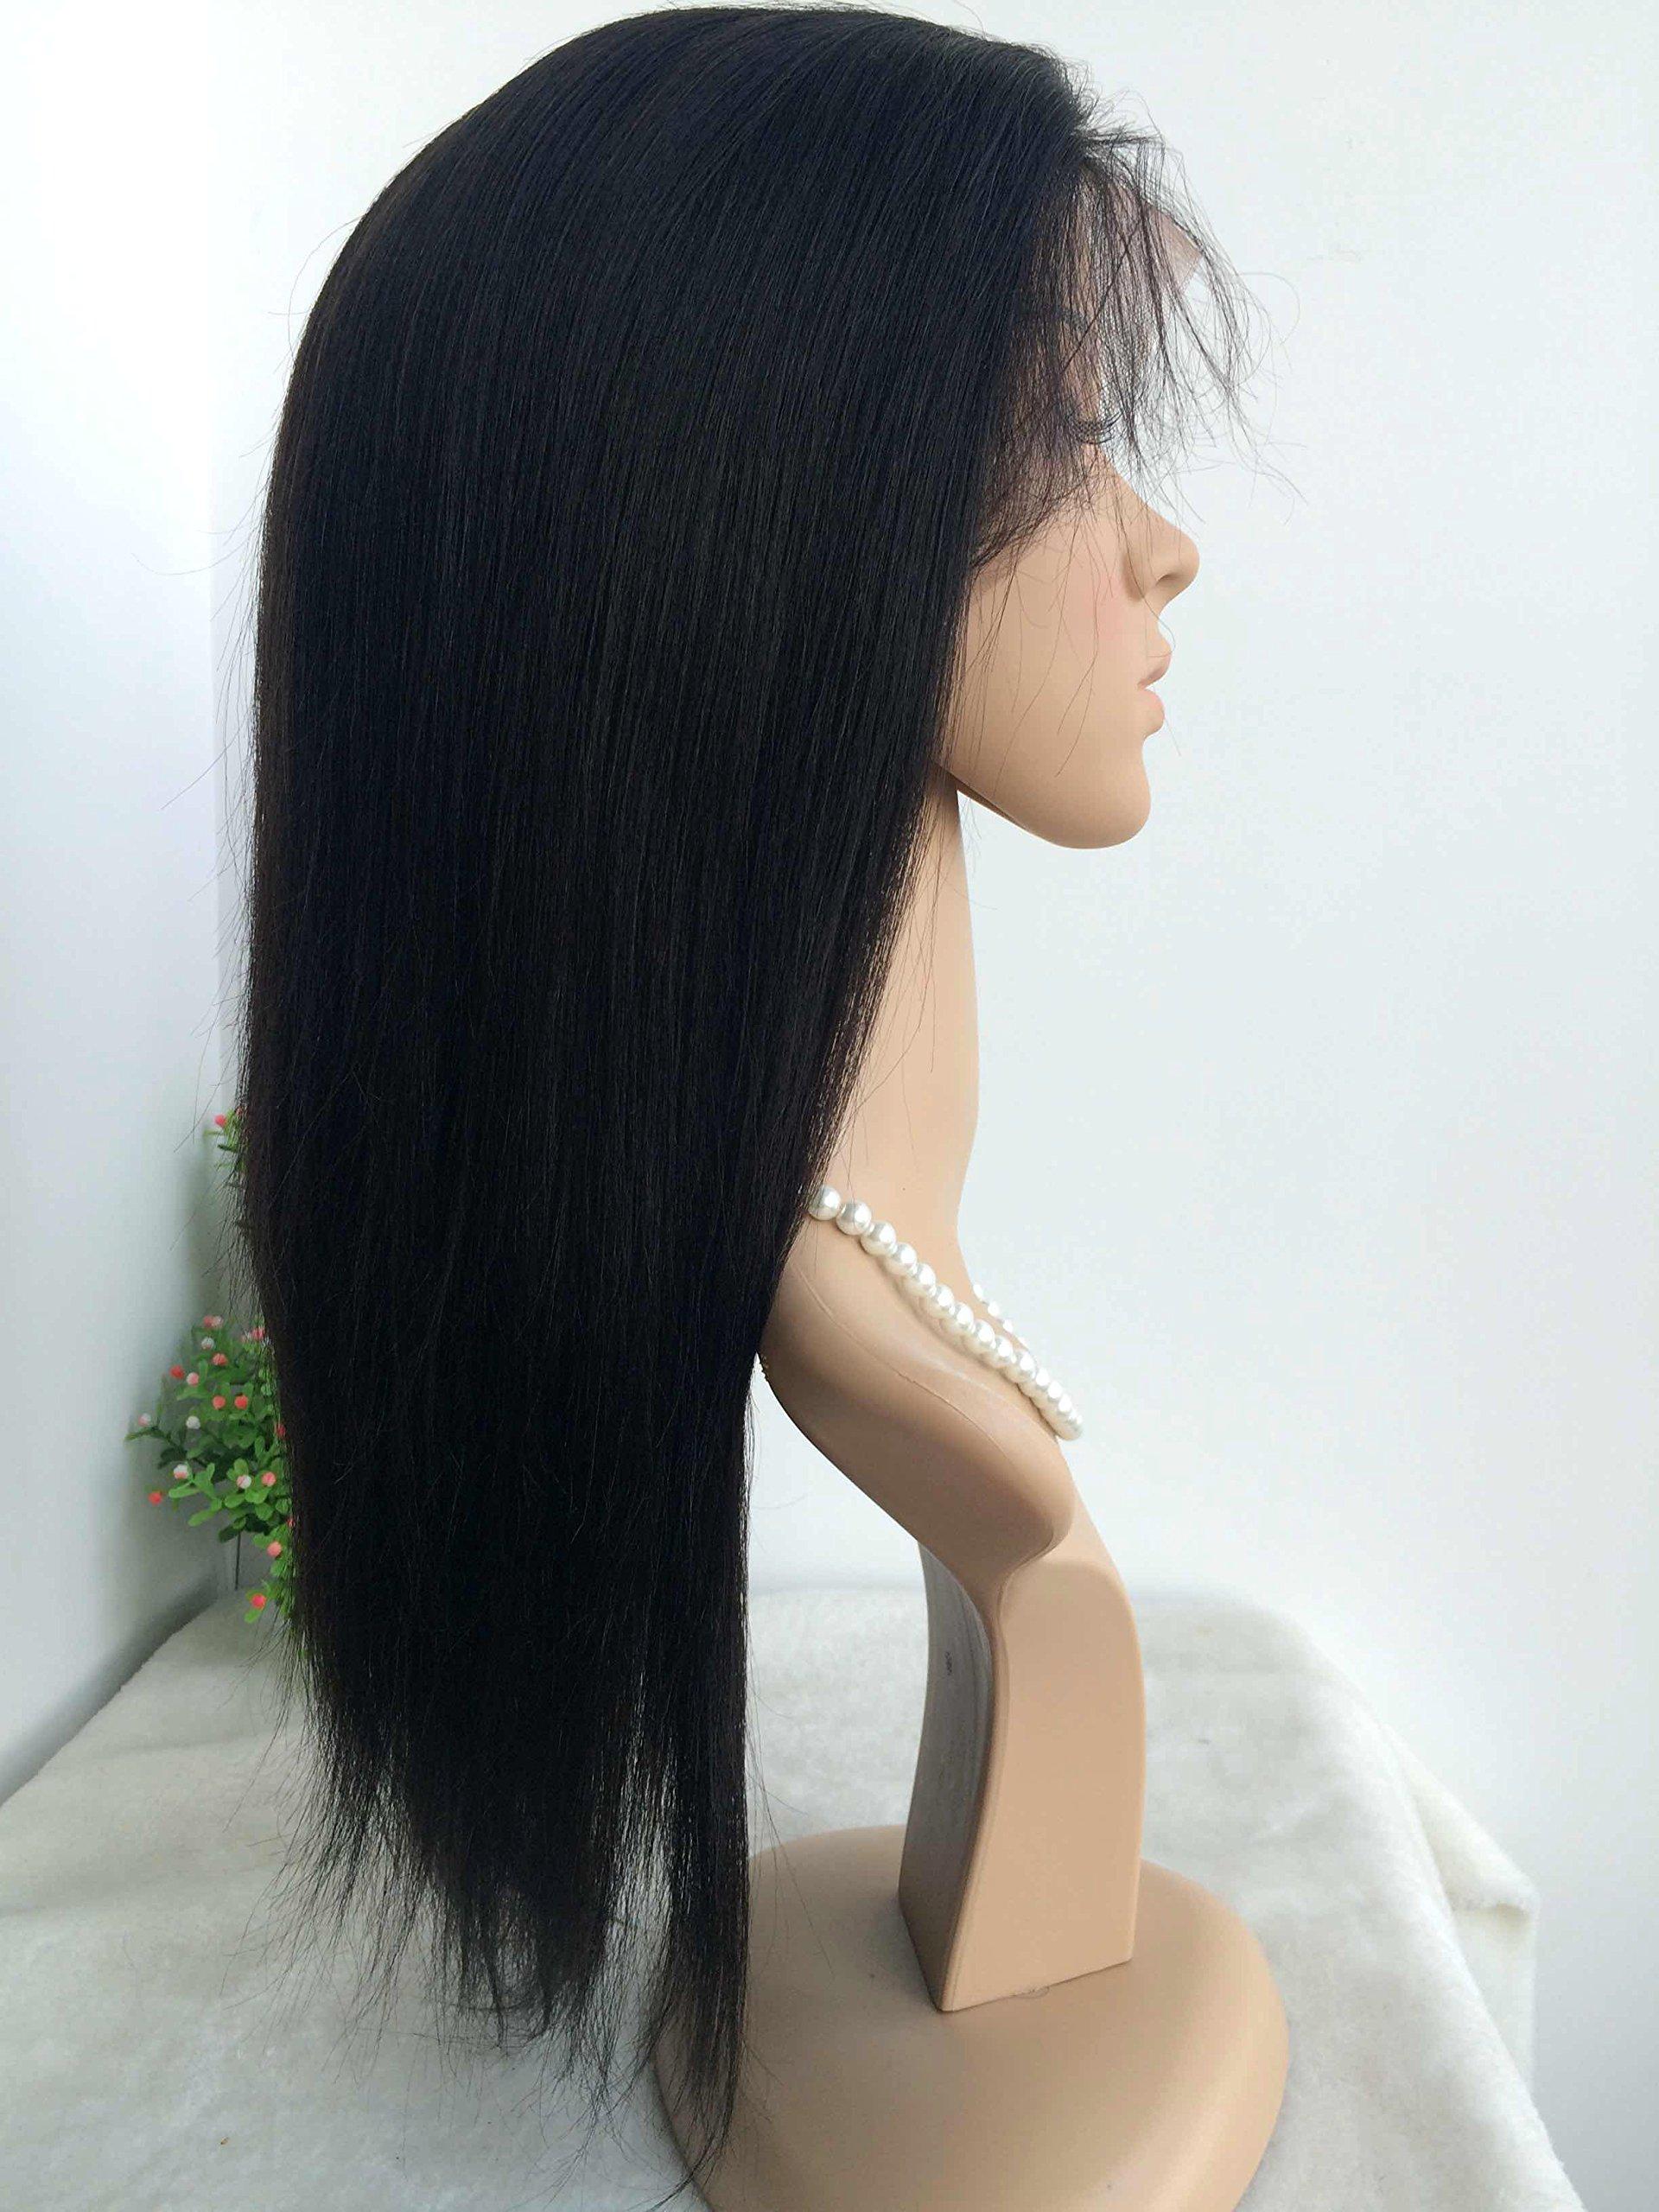 7A grade CHINESE VIRGIN LIGHT YAKI,medium length 16 inch,120 density,GLUELESS FULL LACE WIGS,SILK TOP,BLEACHED KNOTS